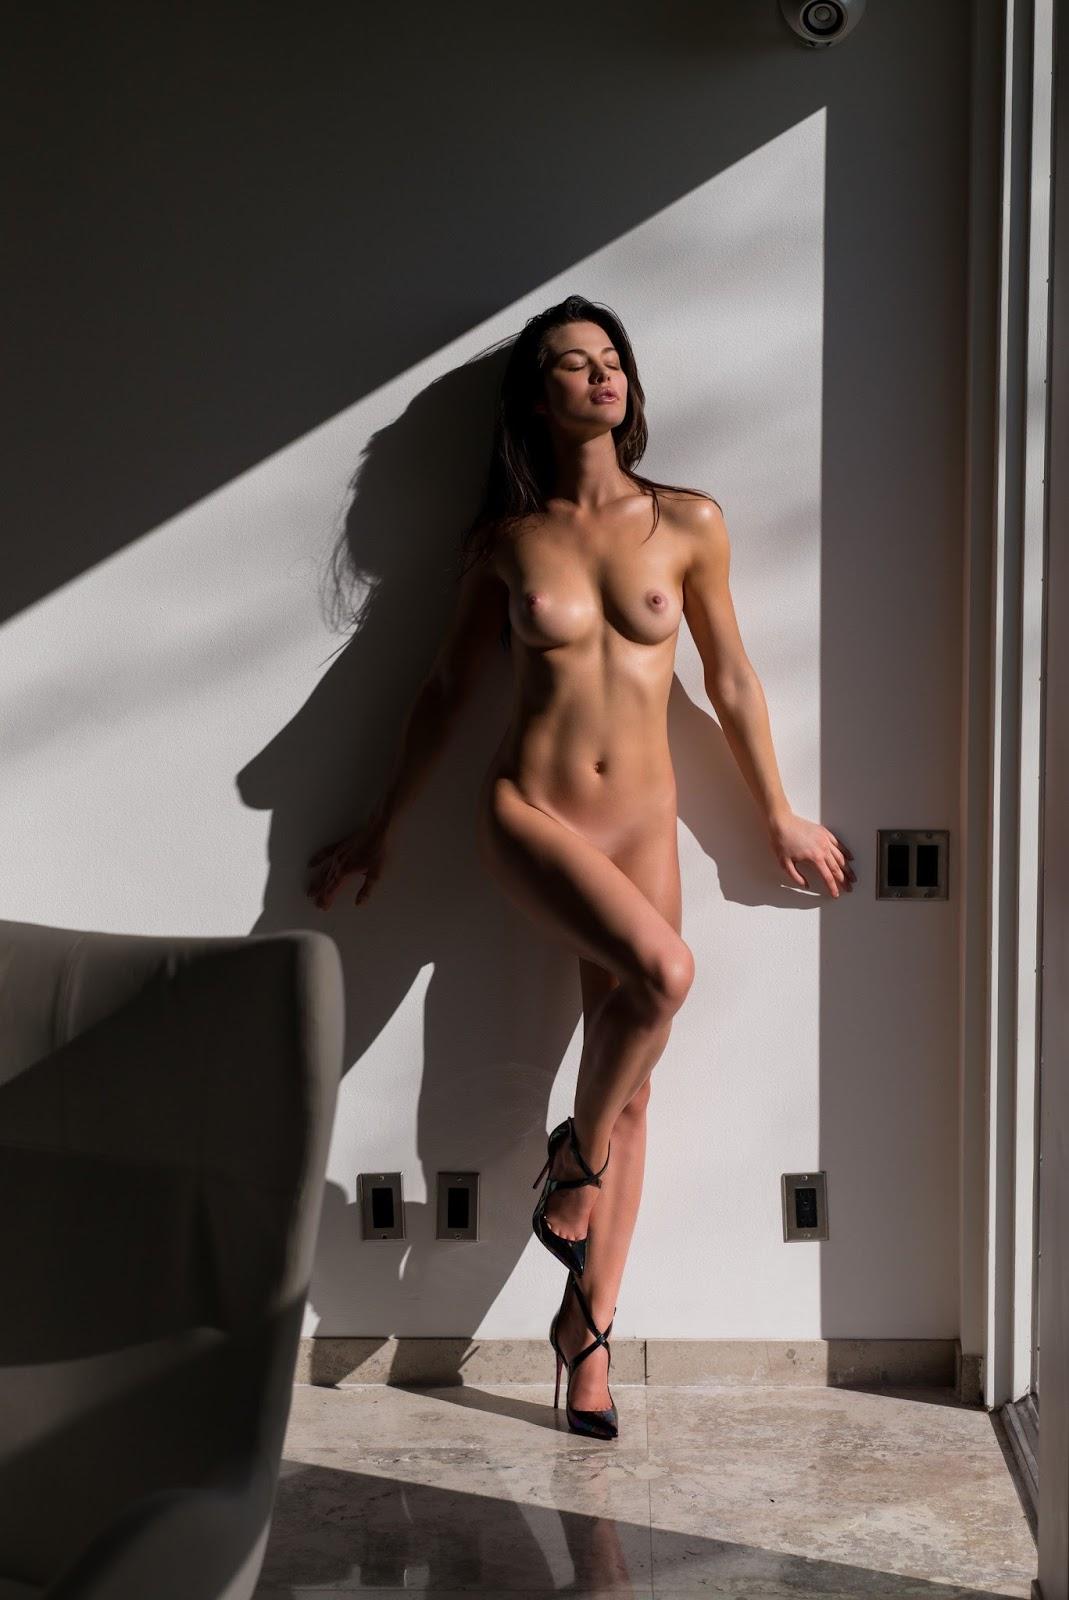 naked-pictures-of-jenny-in-atlanta